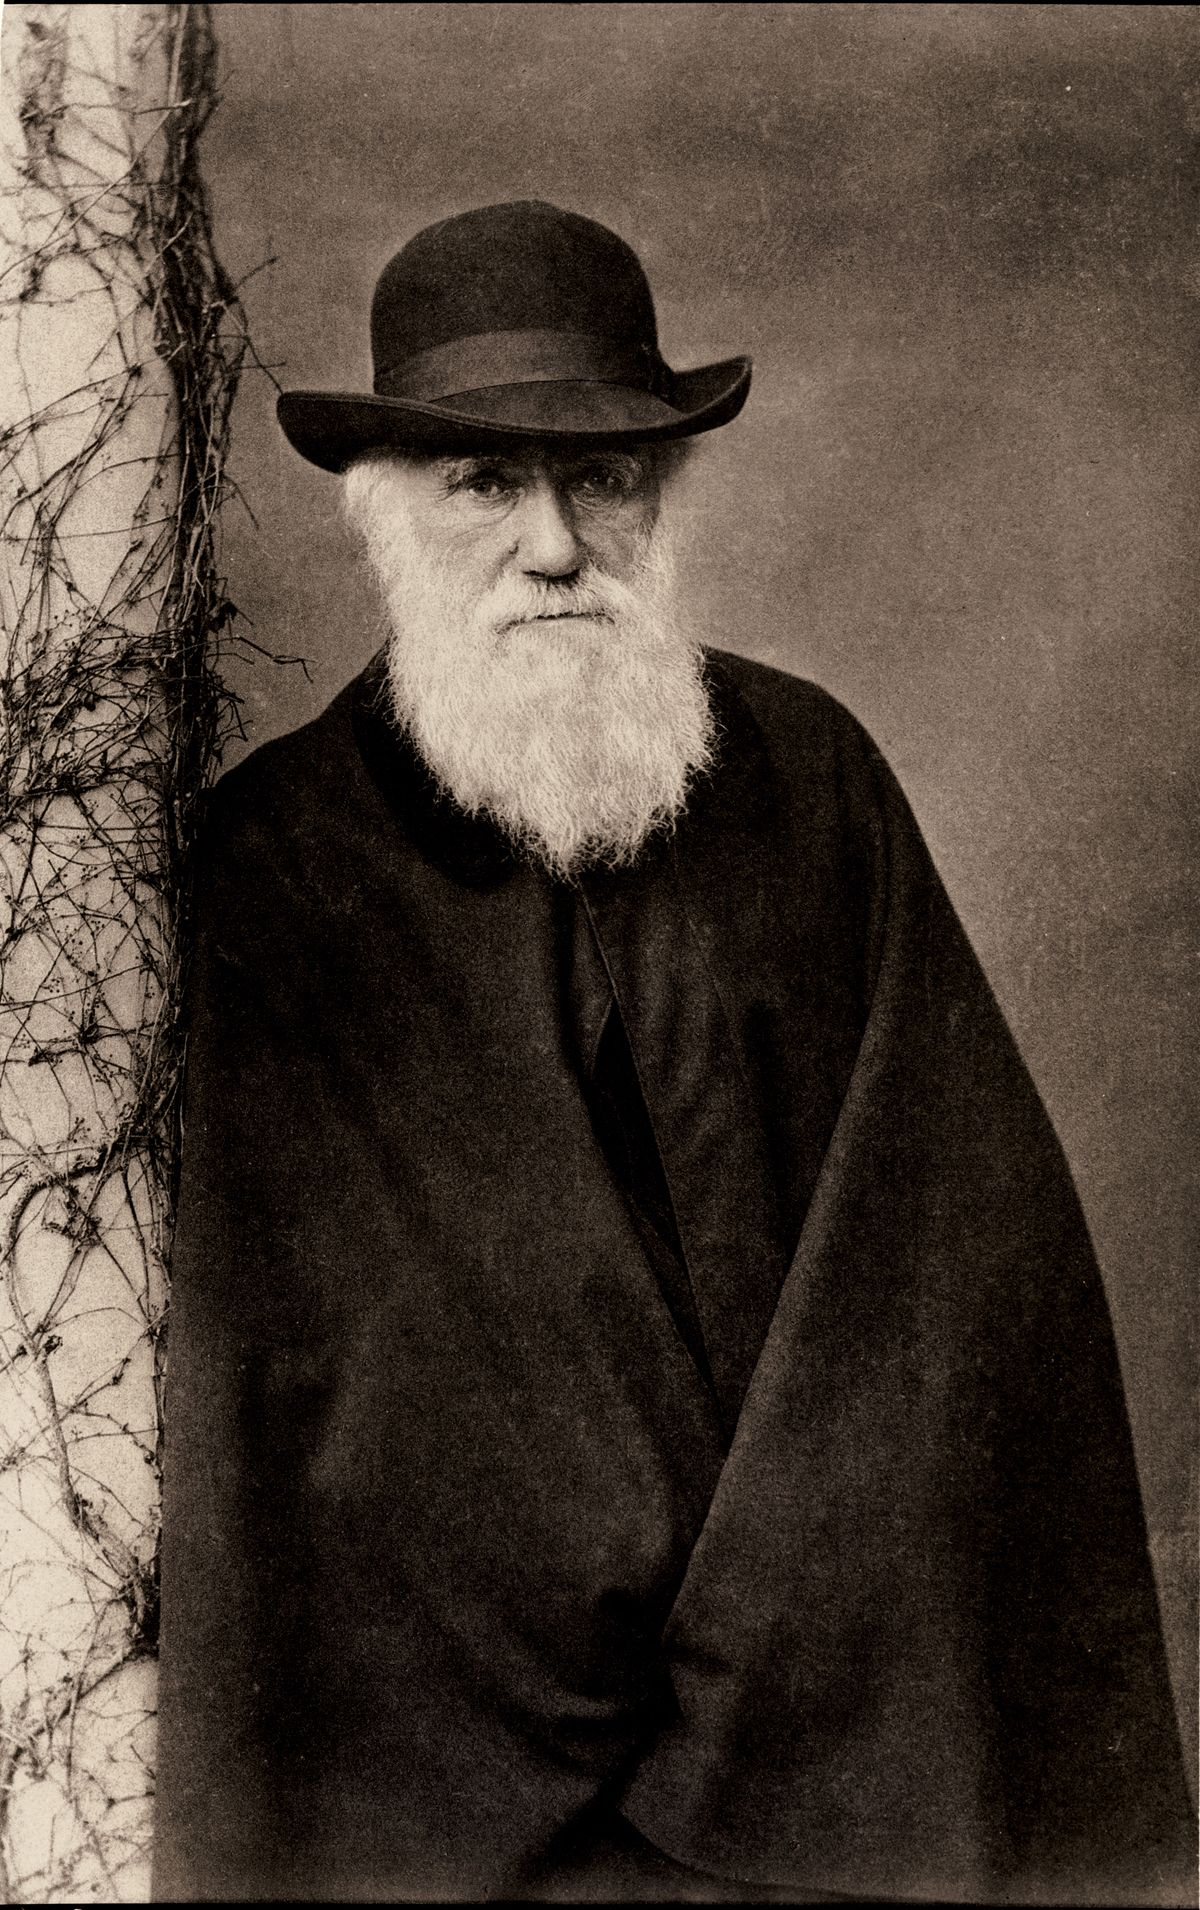 Isnt darwins theory racist?